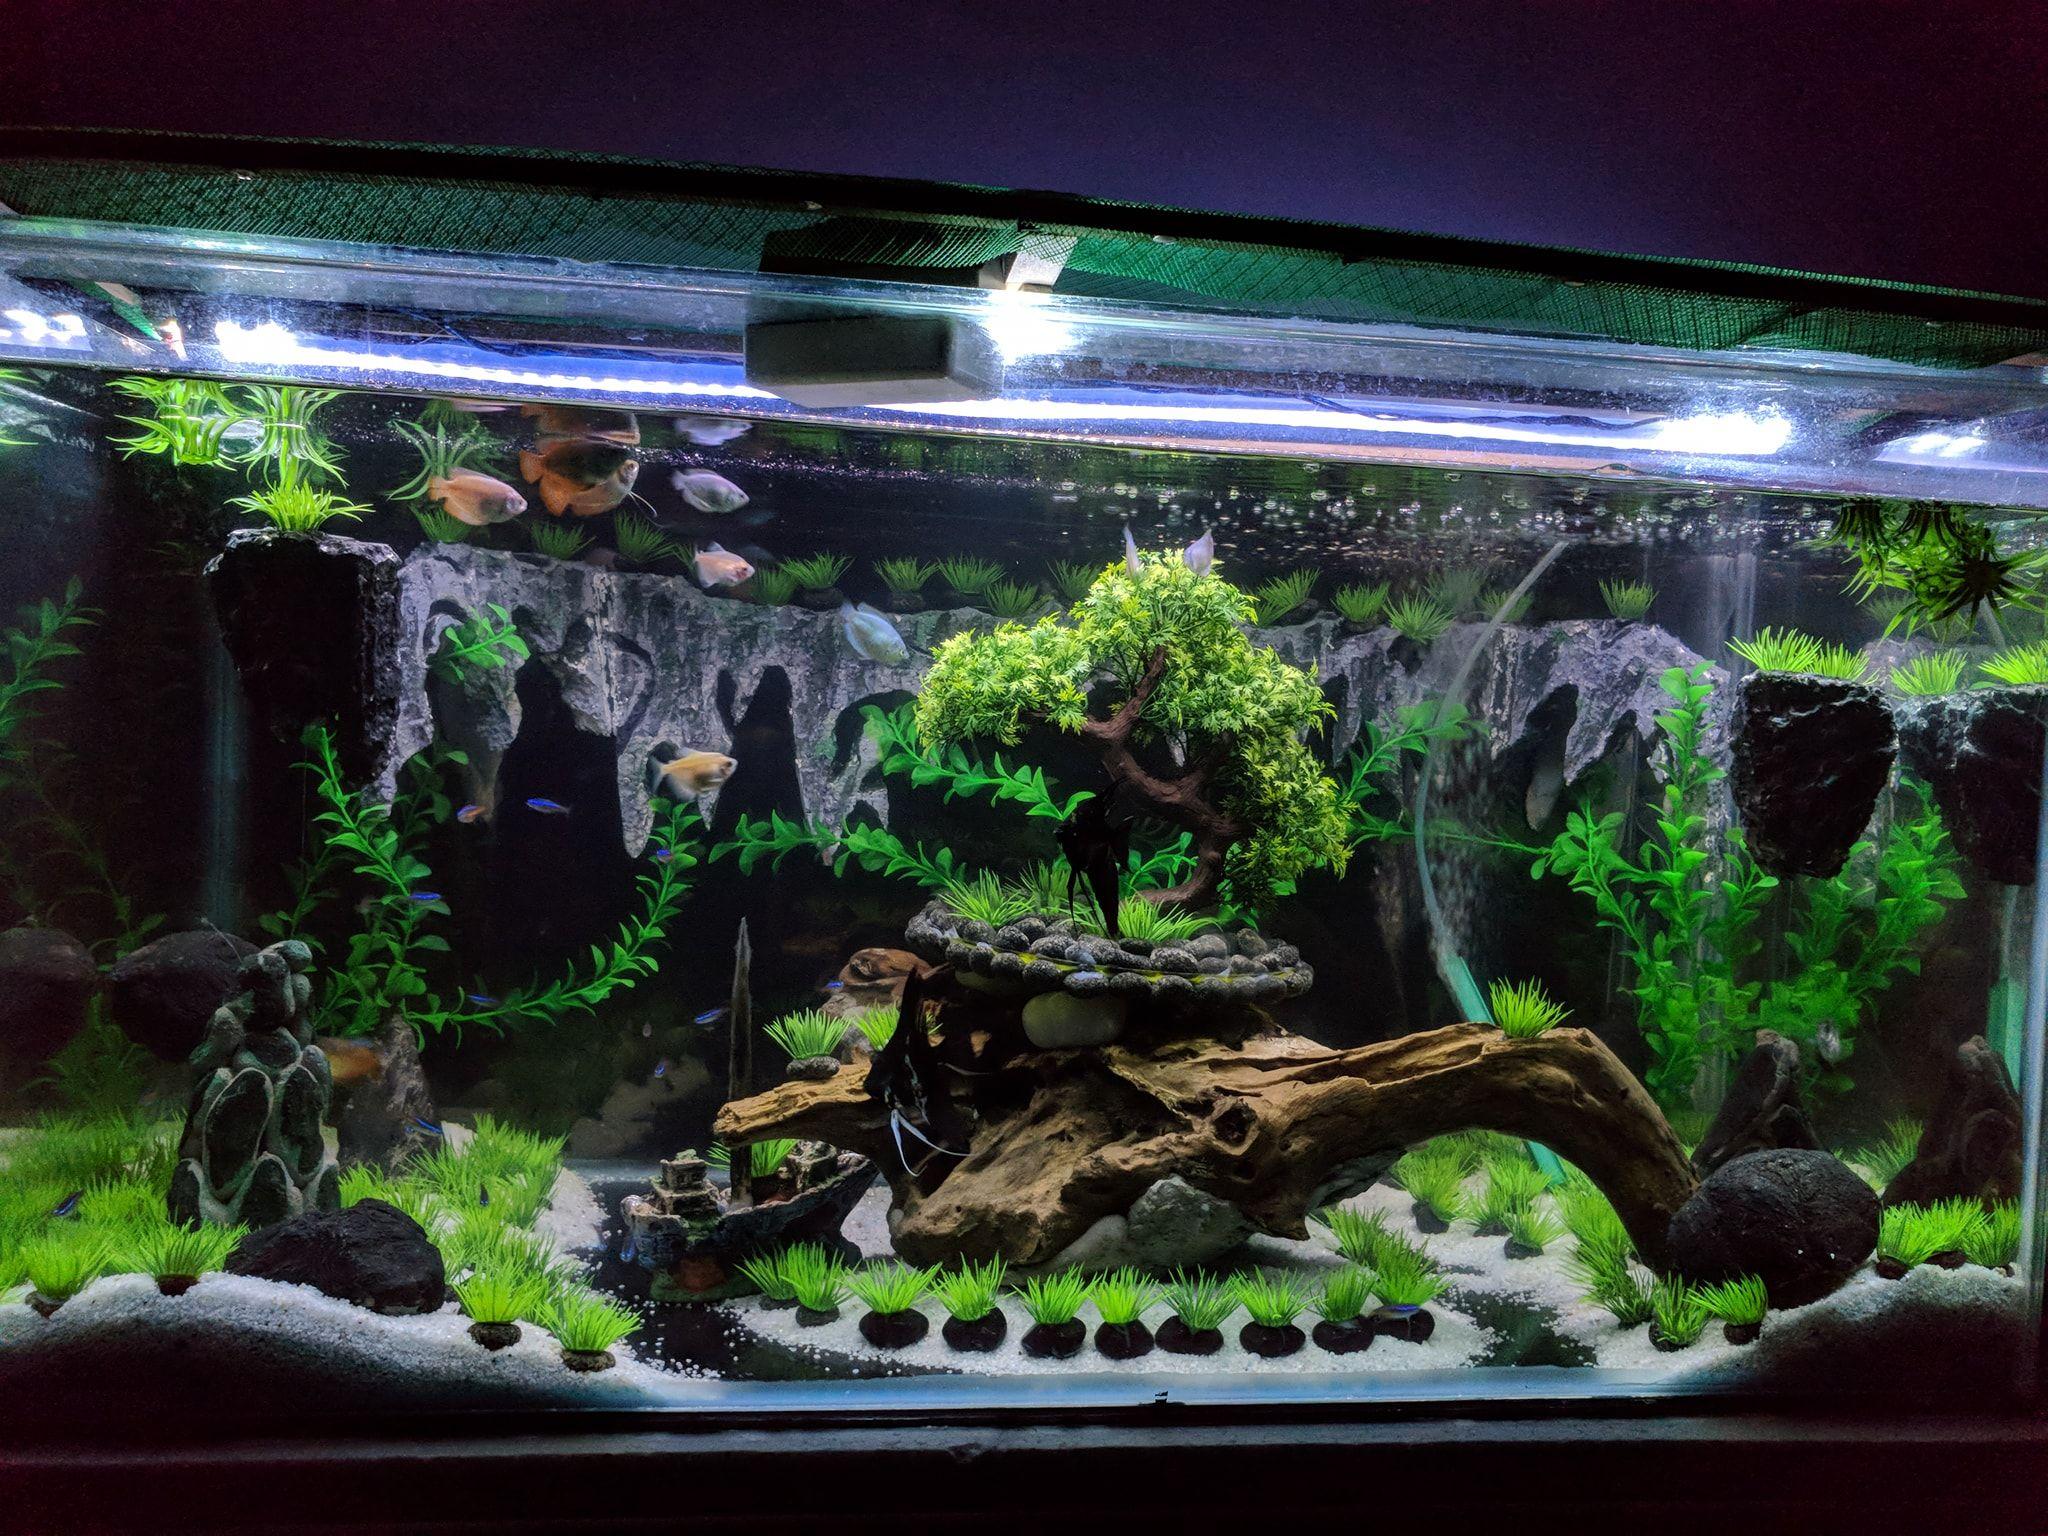 Интересное оформление аквариума фото